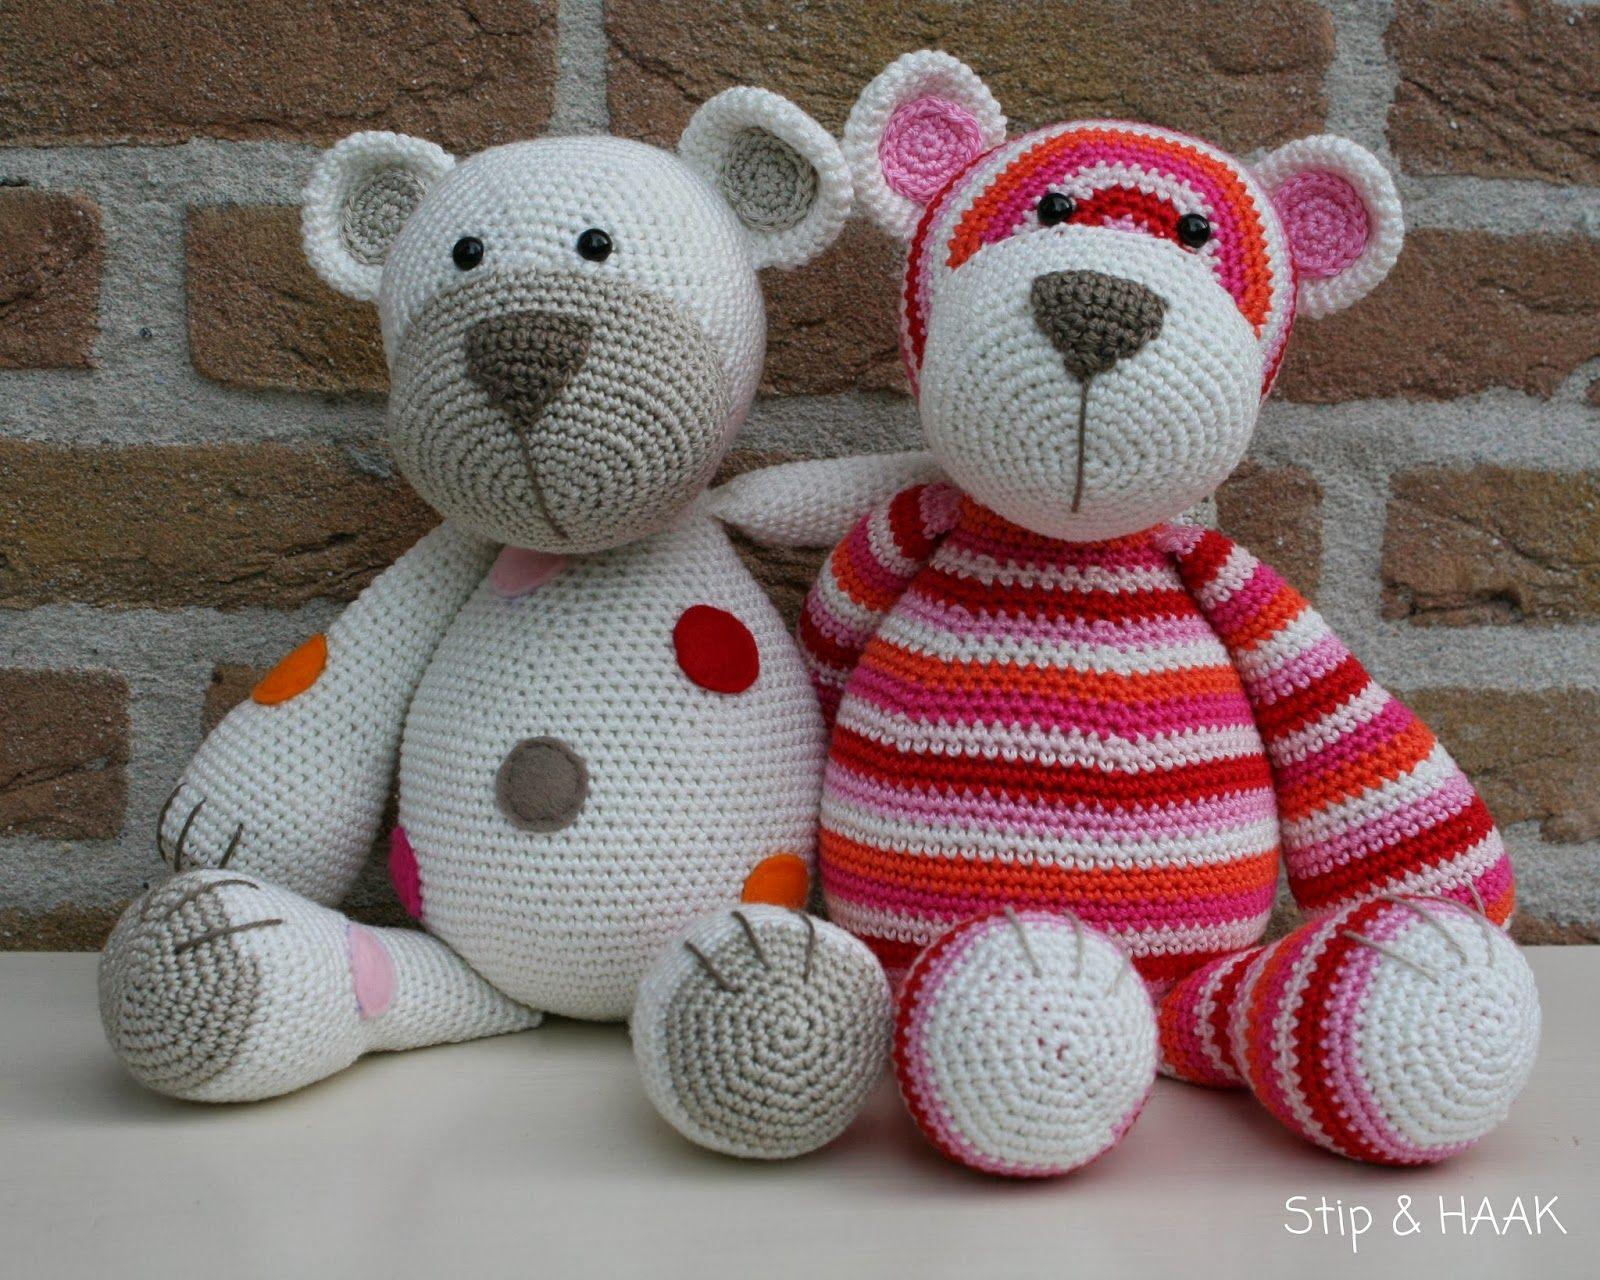 Amigurumi Crochet Patterns Teddy Bears : Stip haak januari Амигуруми amigurumi